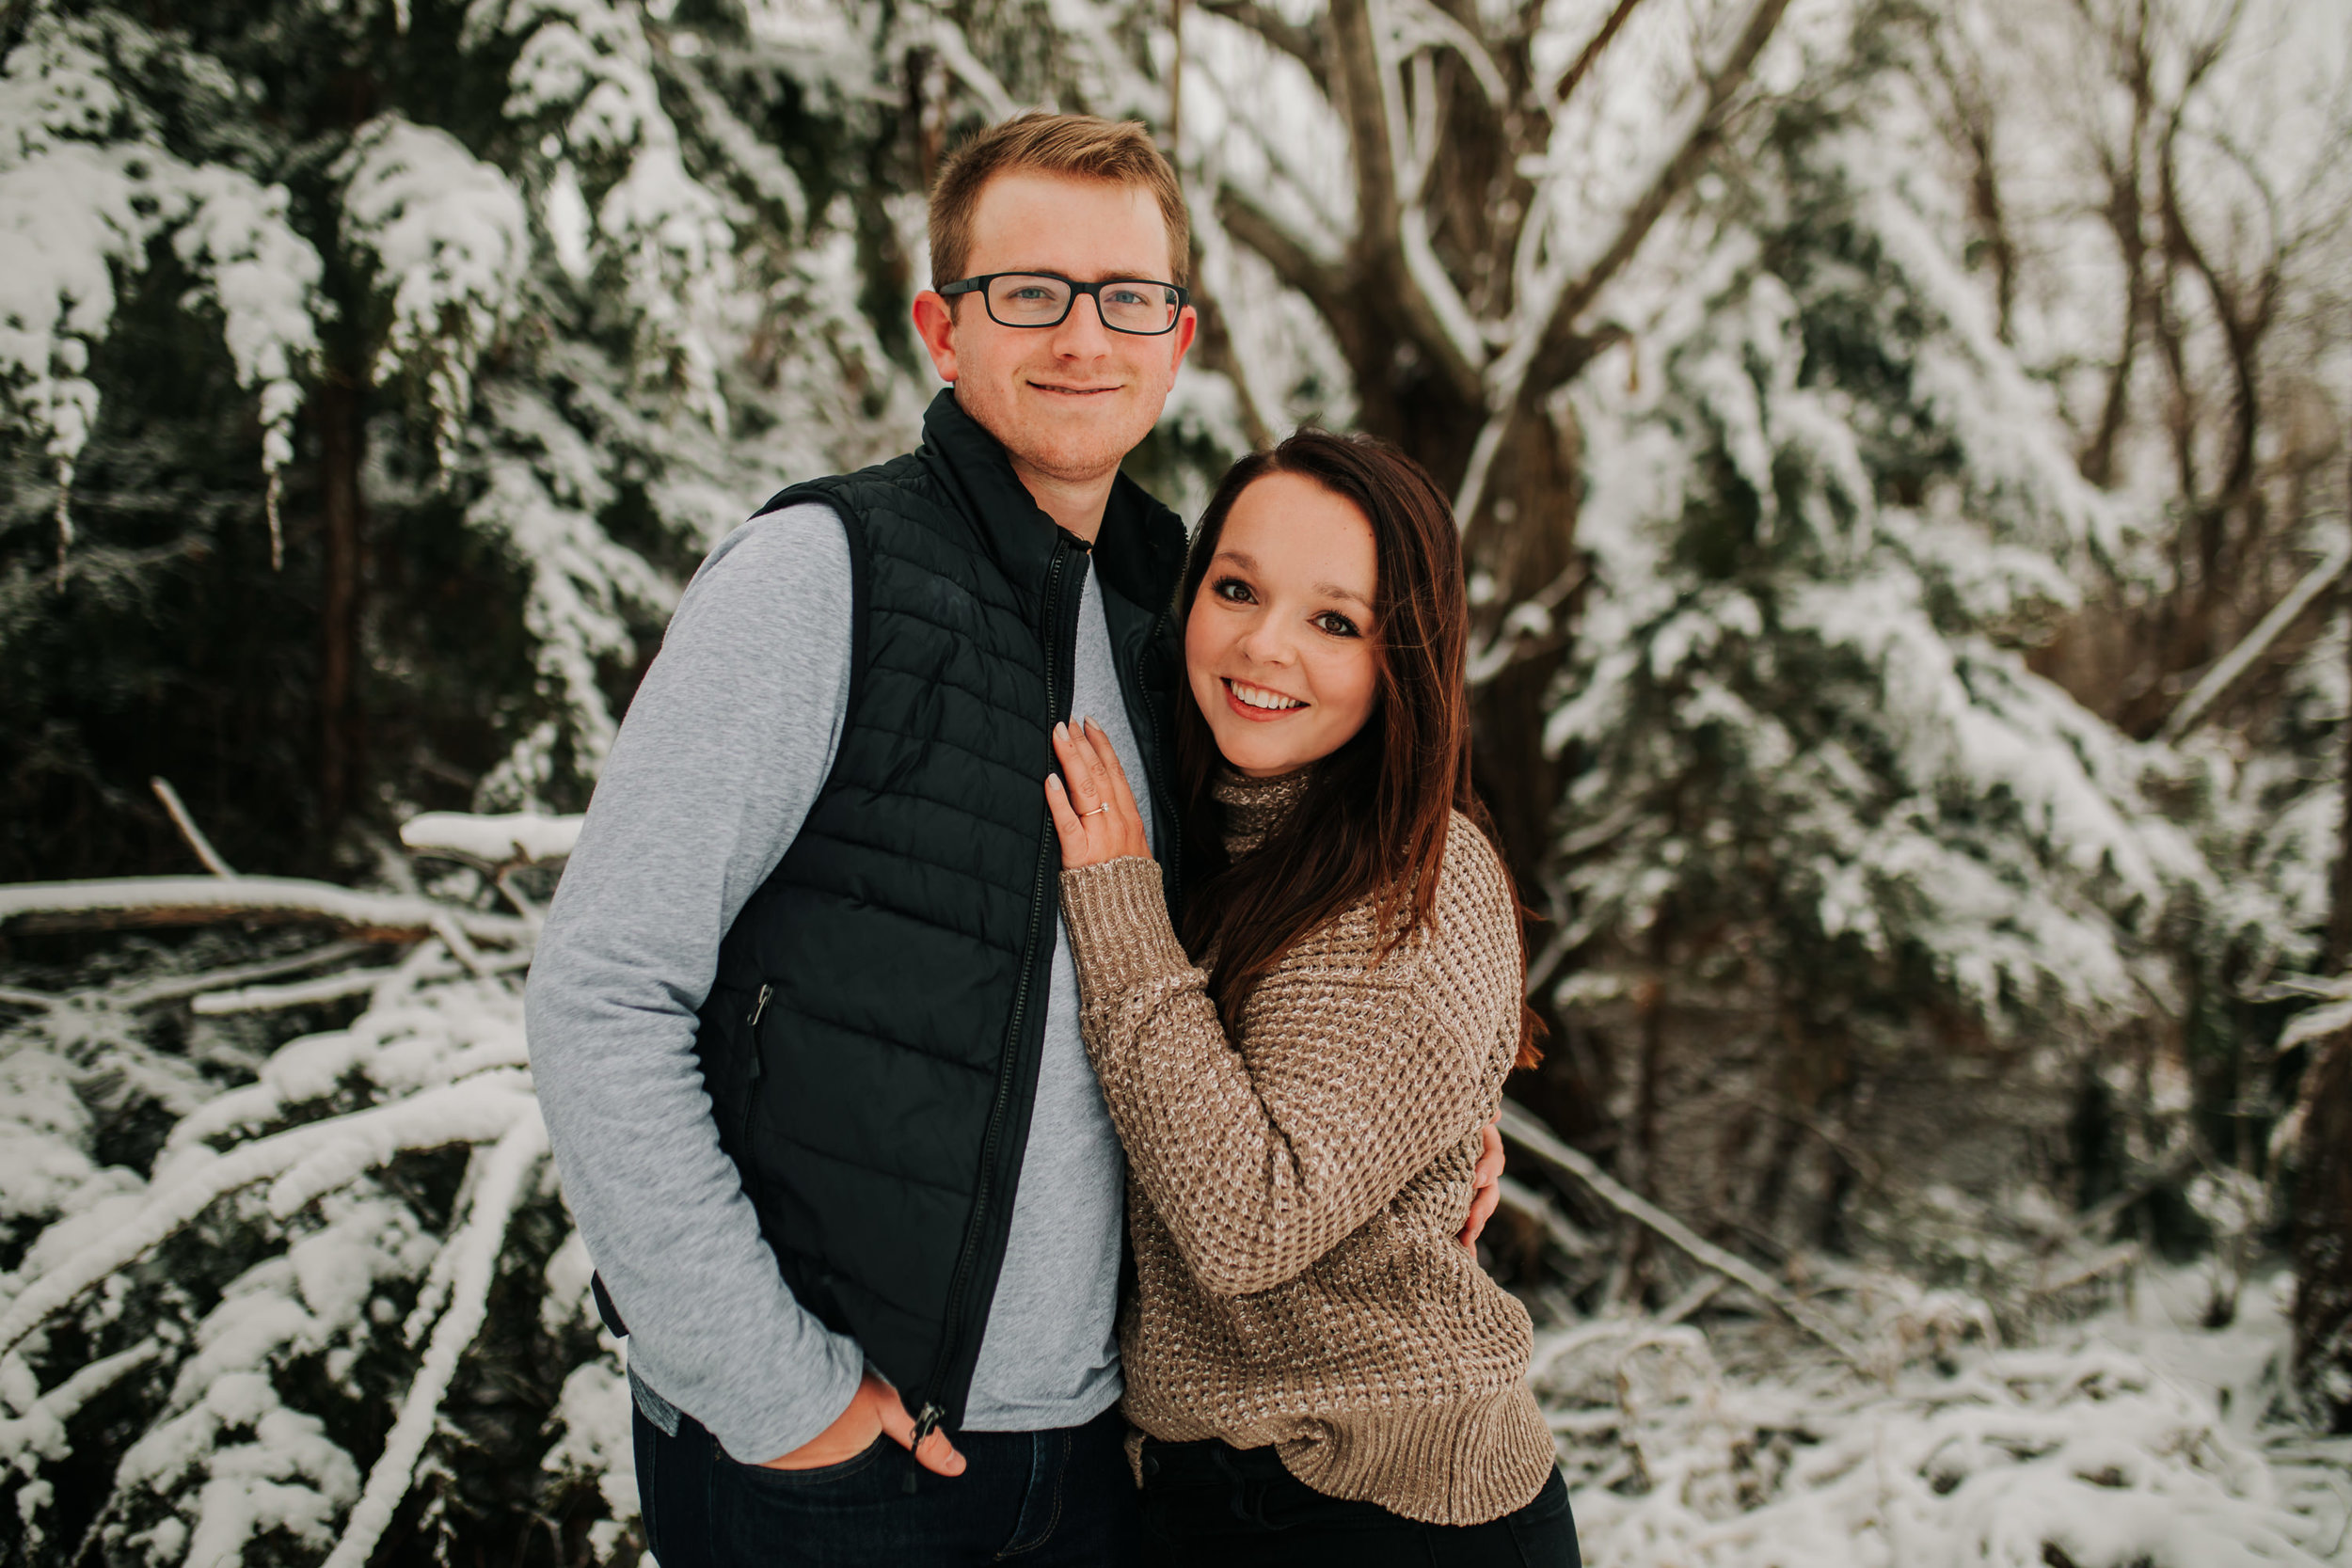 Vanessa & Dan - Engaged - Nathaniel Jensen Photography - Omaha Nebraska Wedding Photographer - Standing Bear Lake - Snowy Engagement Session-56.jpg